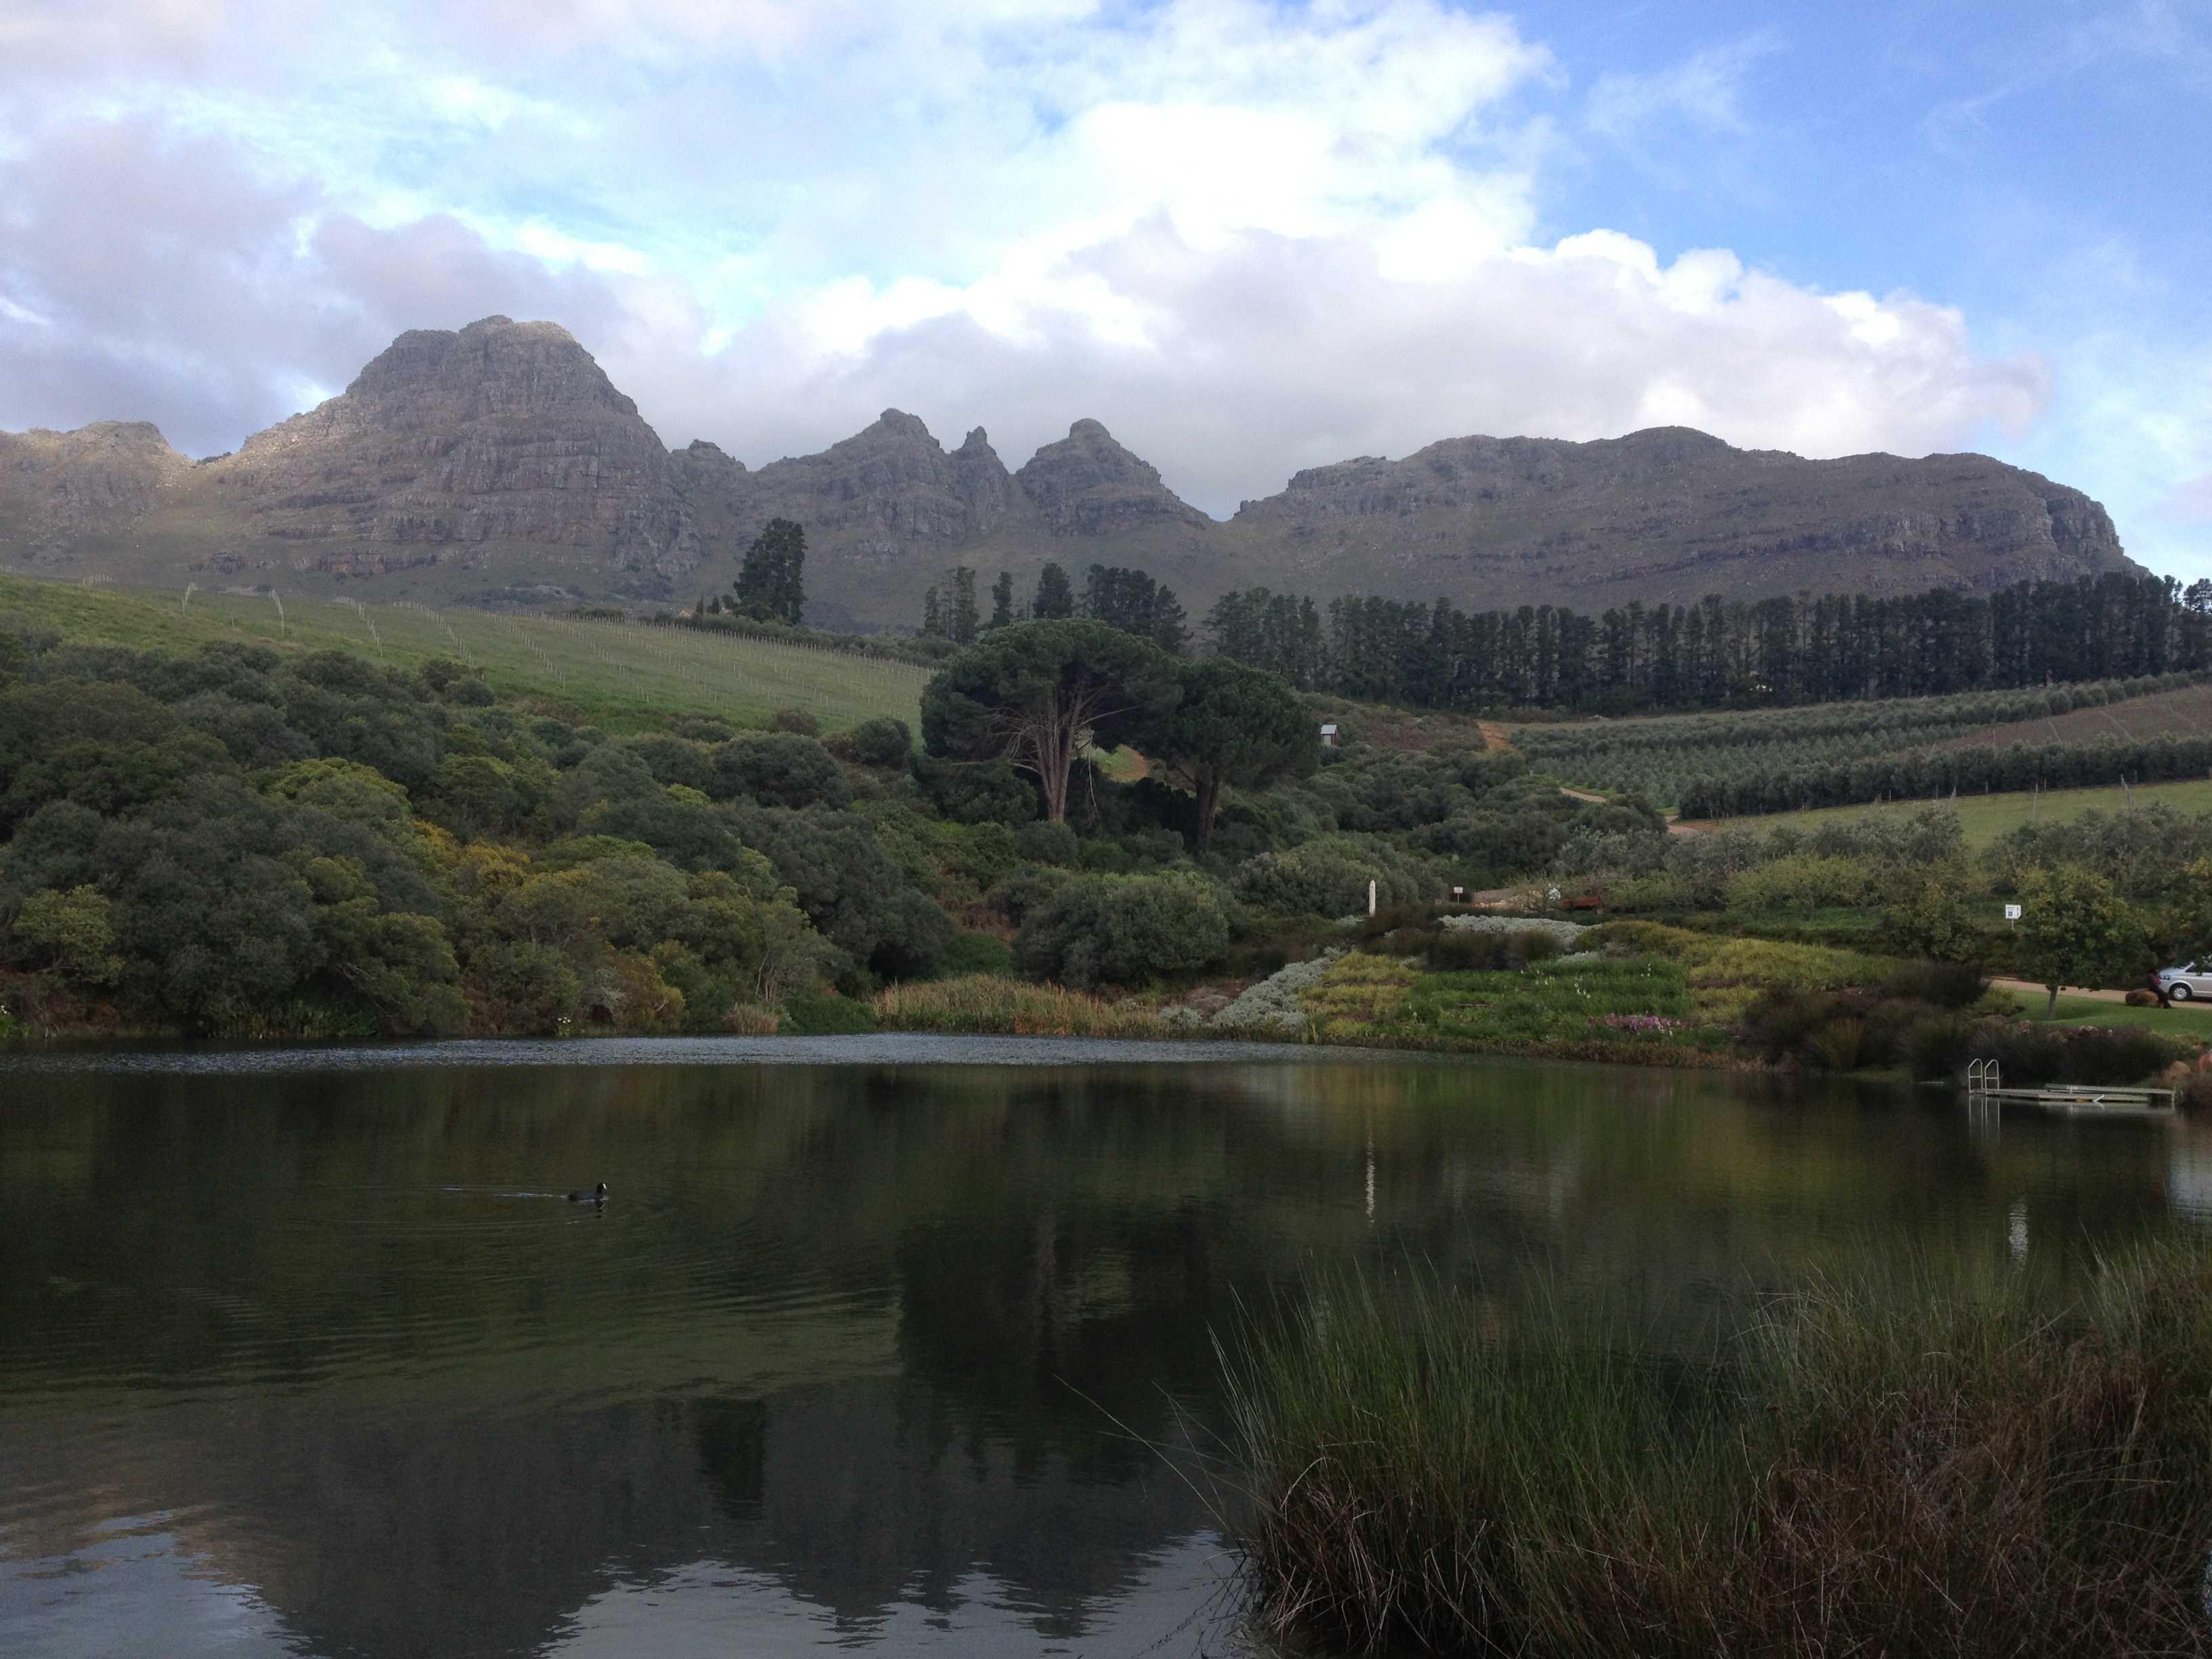 Hidden Valley Wine Estate and Overature